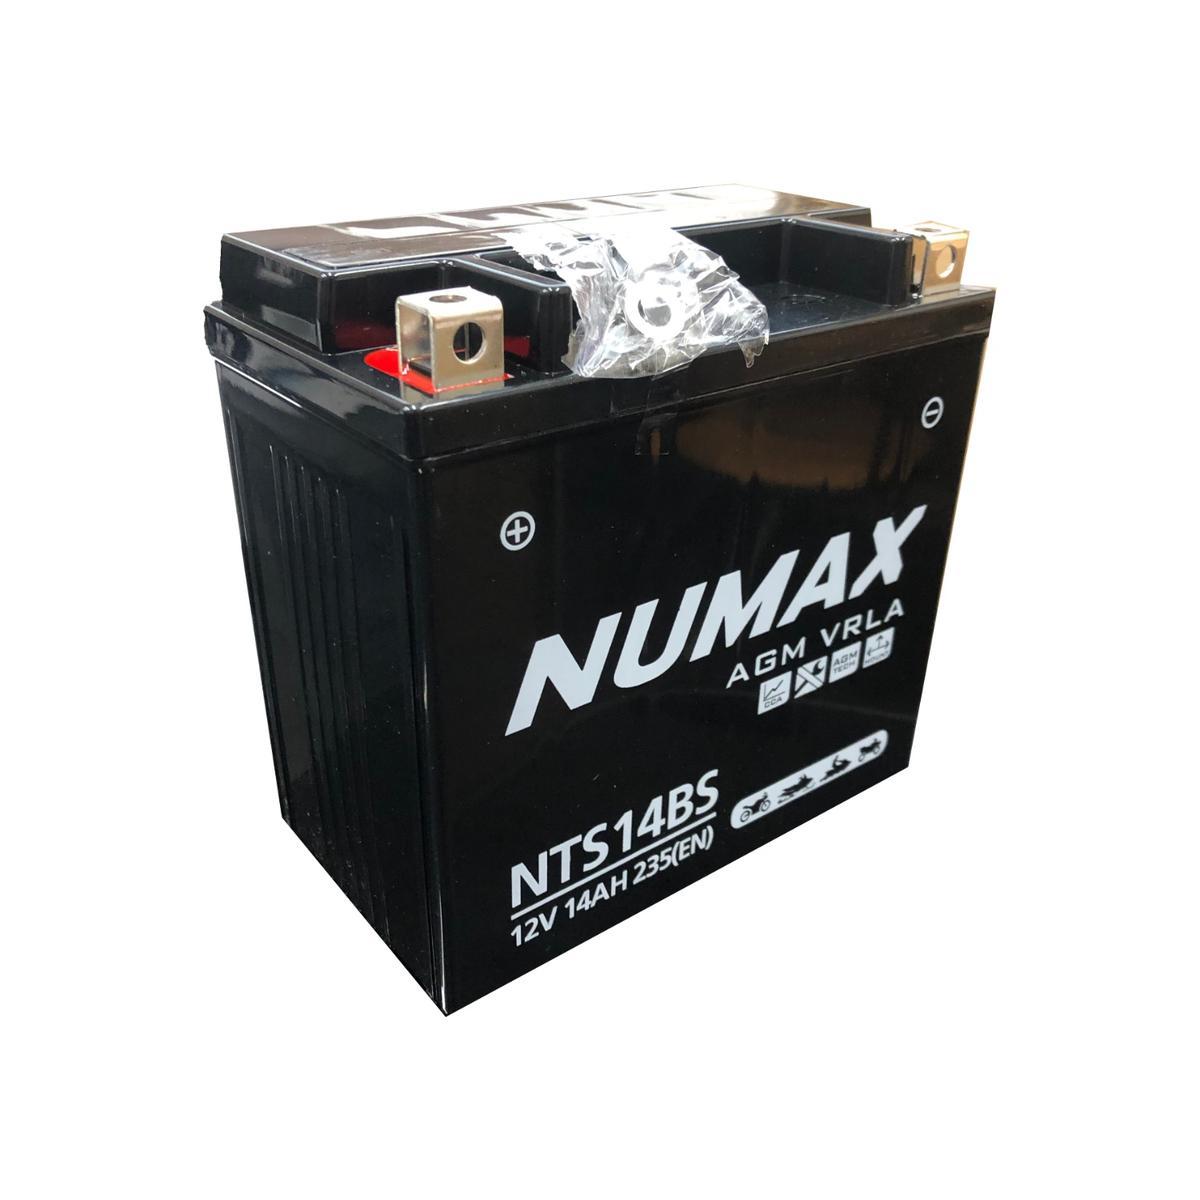 Numax NTS14BS 12v Motorbike Bike Battery KAWASAKI 1100cc ZRX1000 YTX14-4